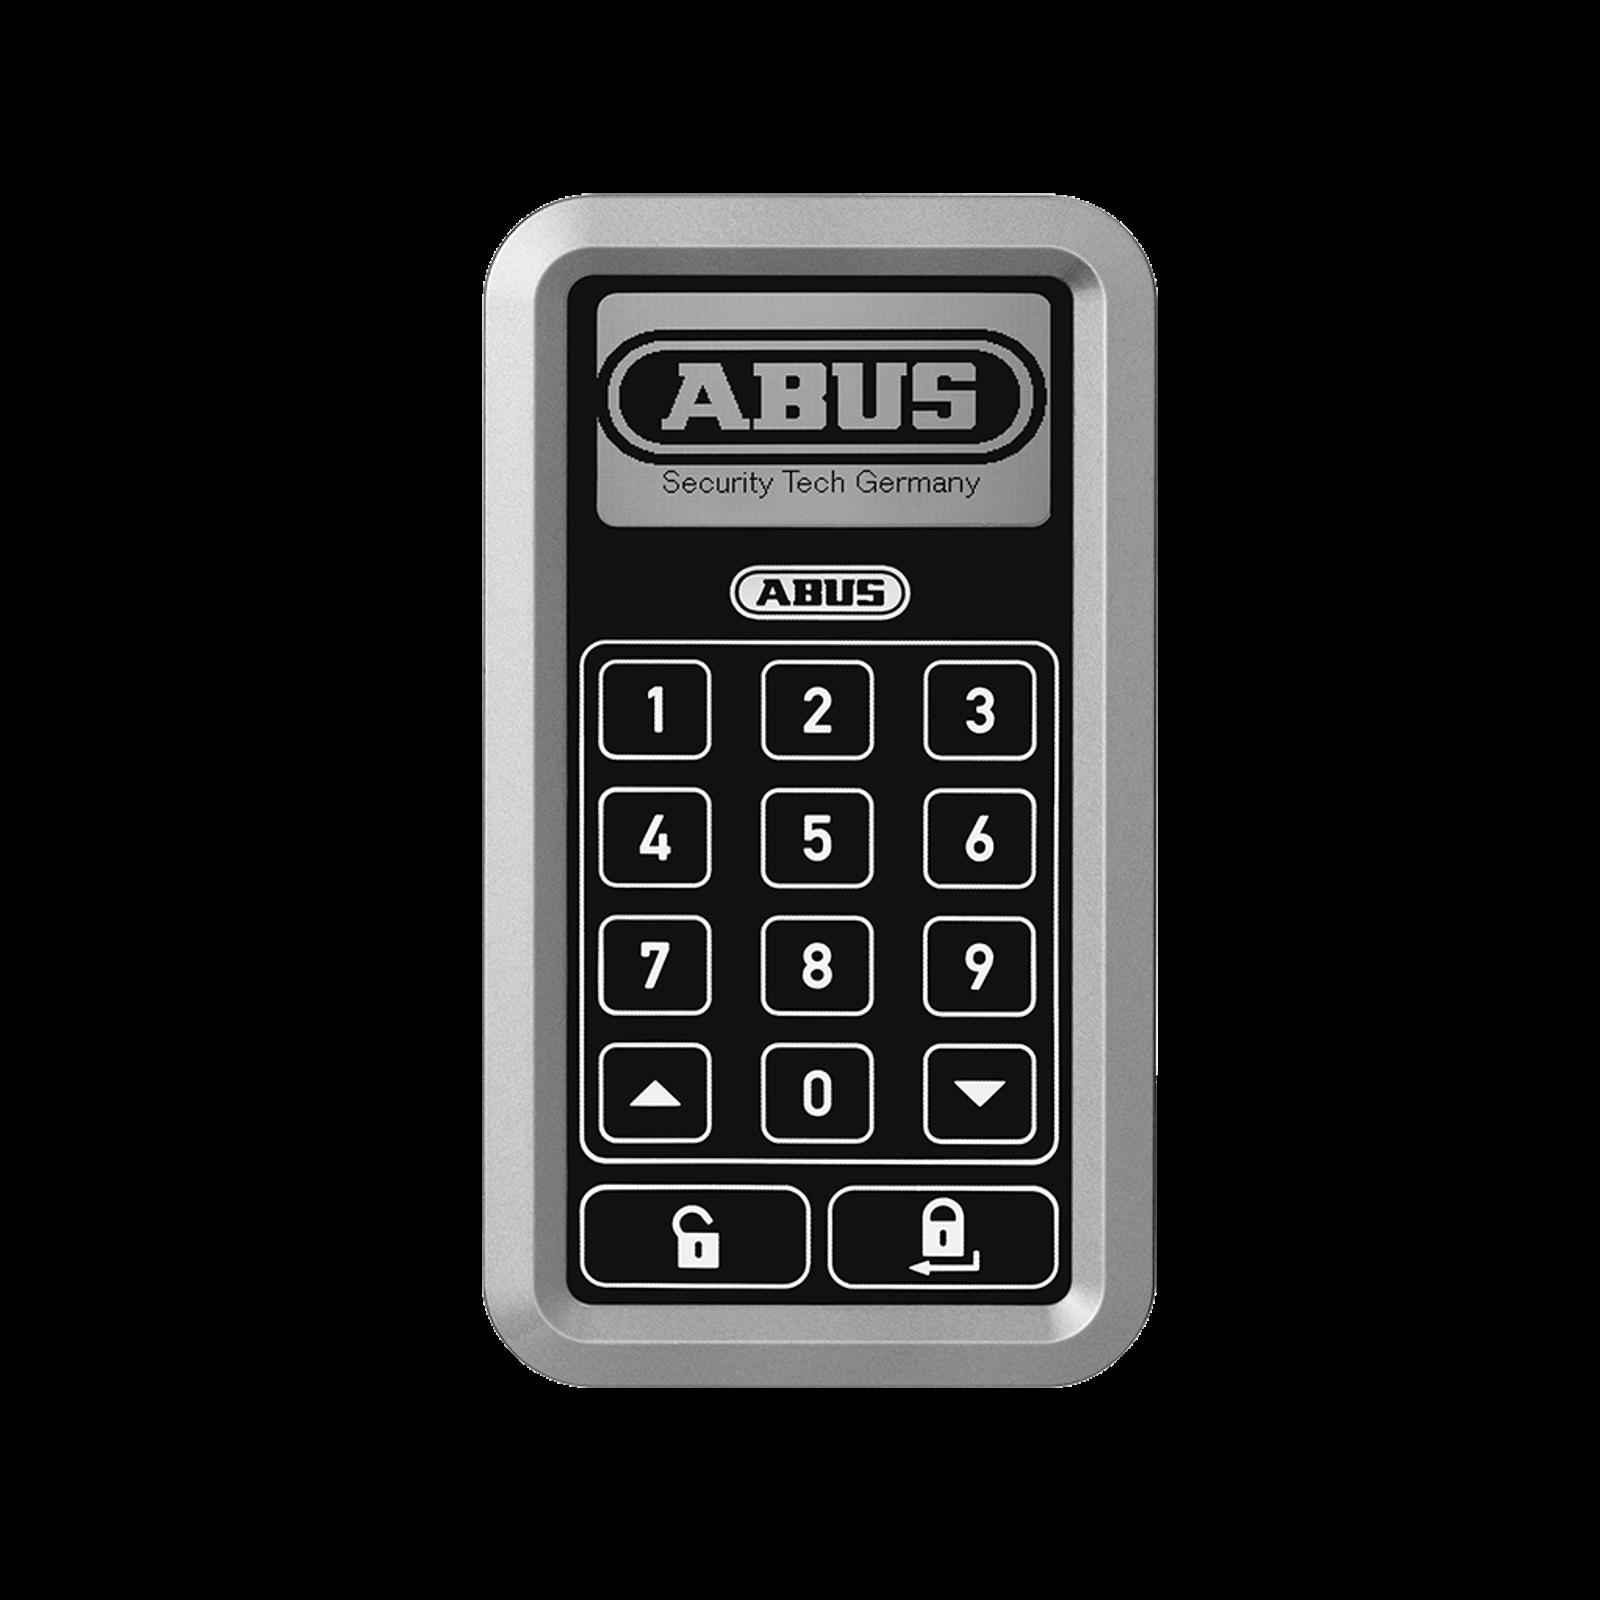 ABUS HomeTec Pro Funk-Tastatur in silber